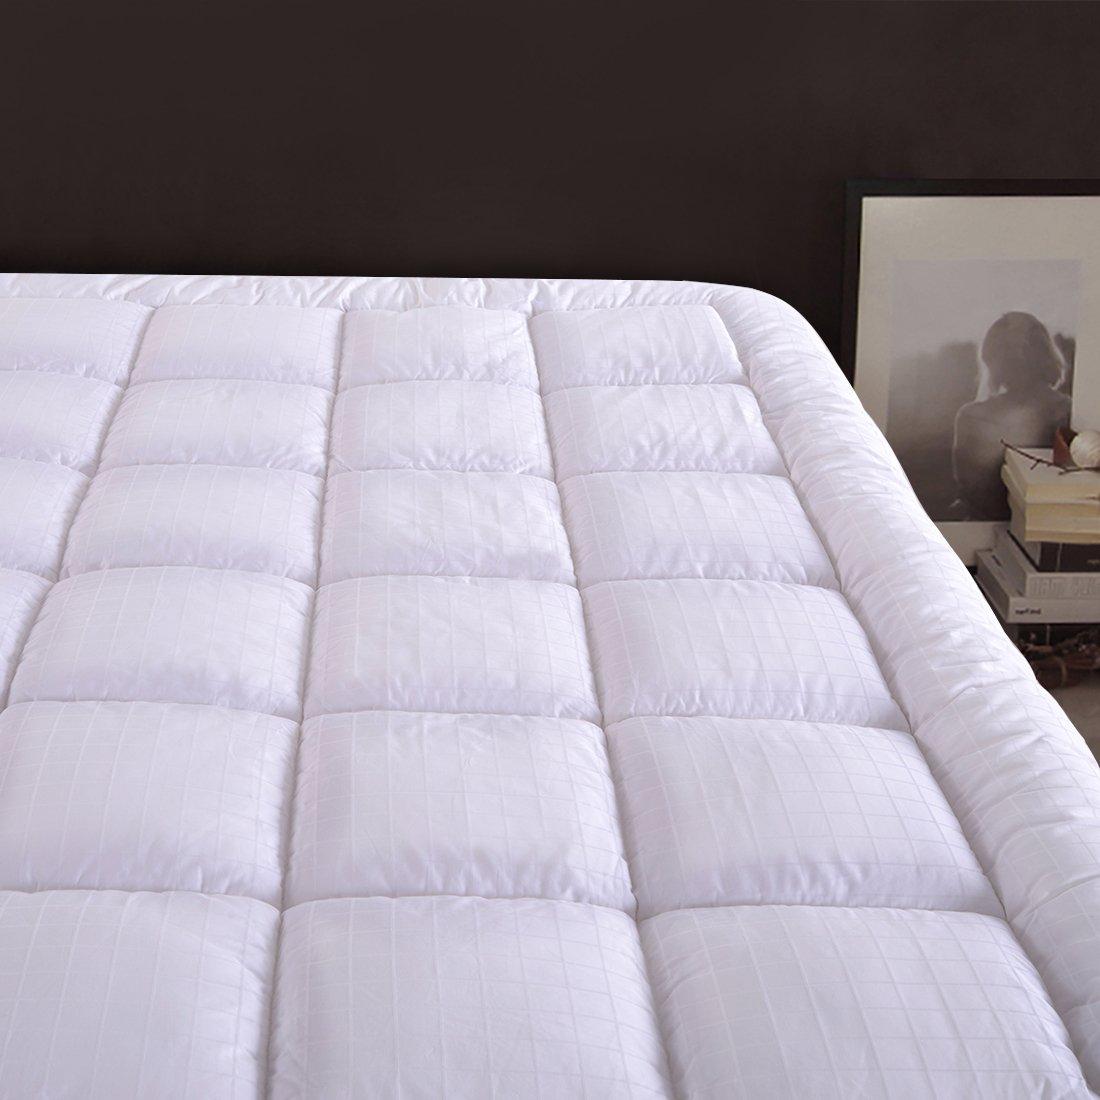 "Cloudream Full Overfilled Mattress Pad Cover 8-22""Deep Pocket-300TC Snow Down Alternative Pillow Top Mattress Topper"